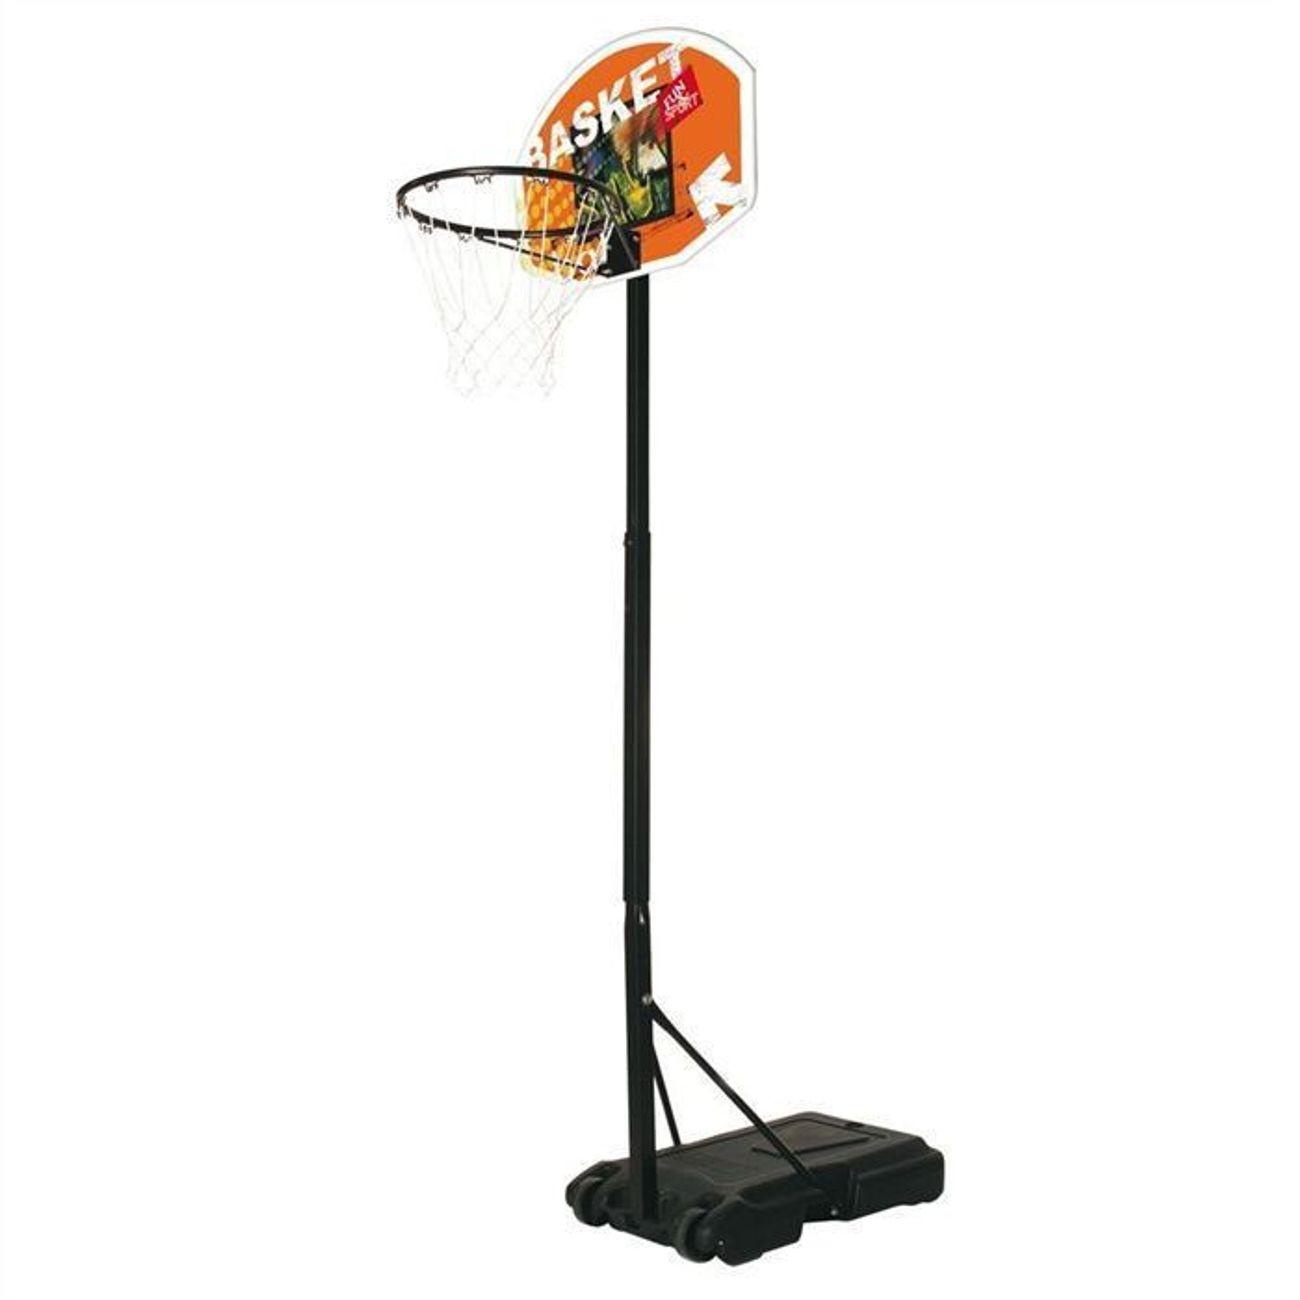 MONDO MONDO Panier de basket Junior ajustable de 165 a 205 cm